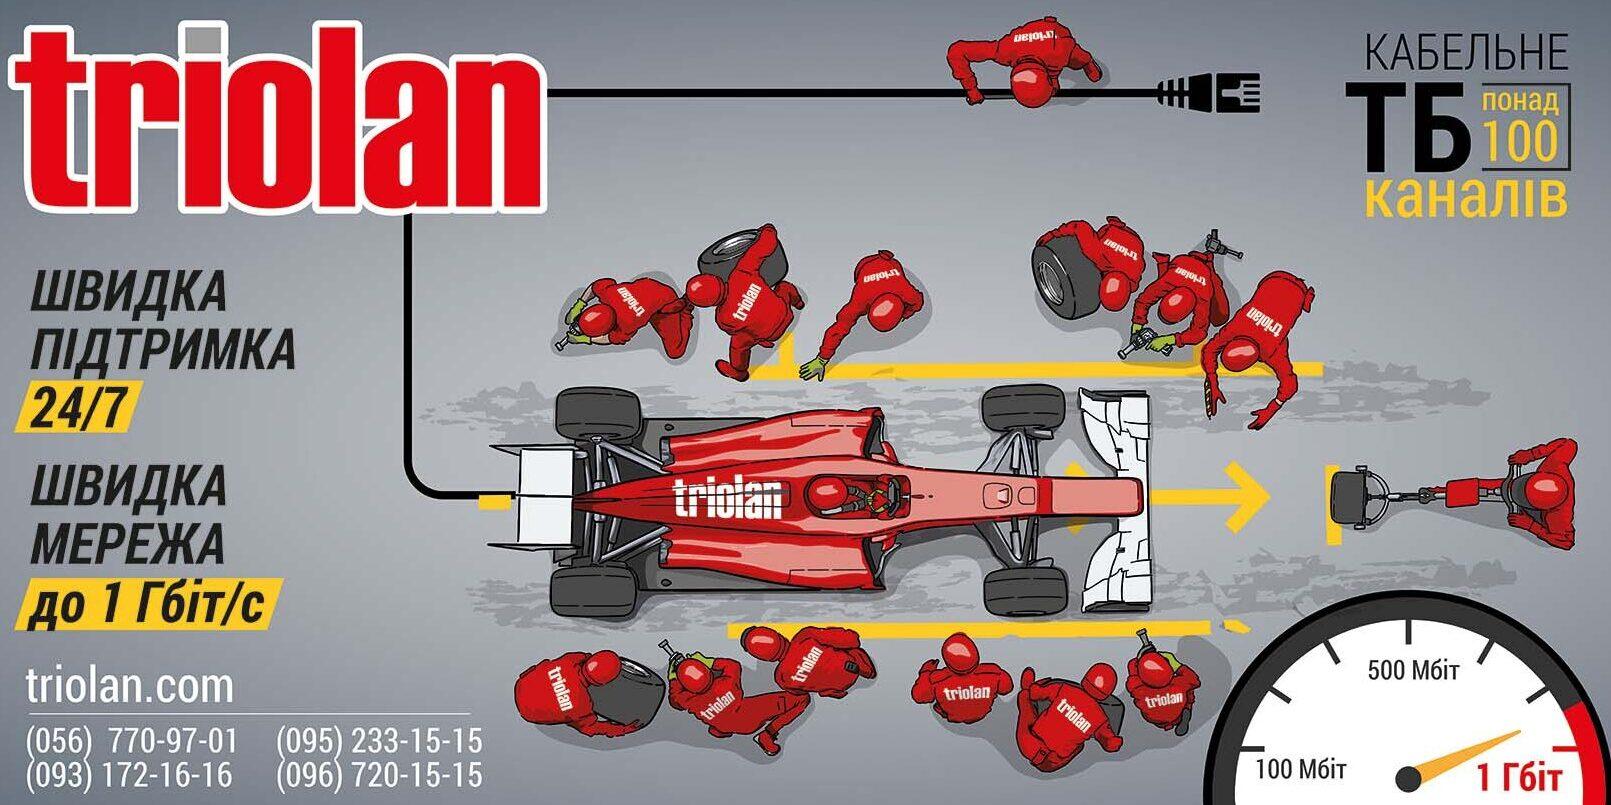 triolan 6x3 1